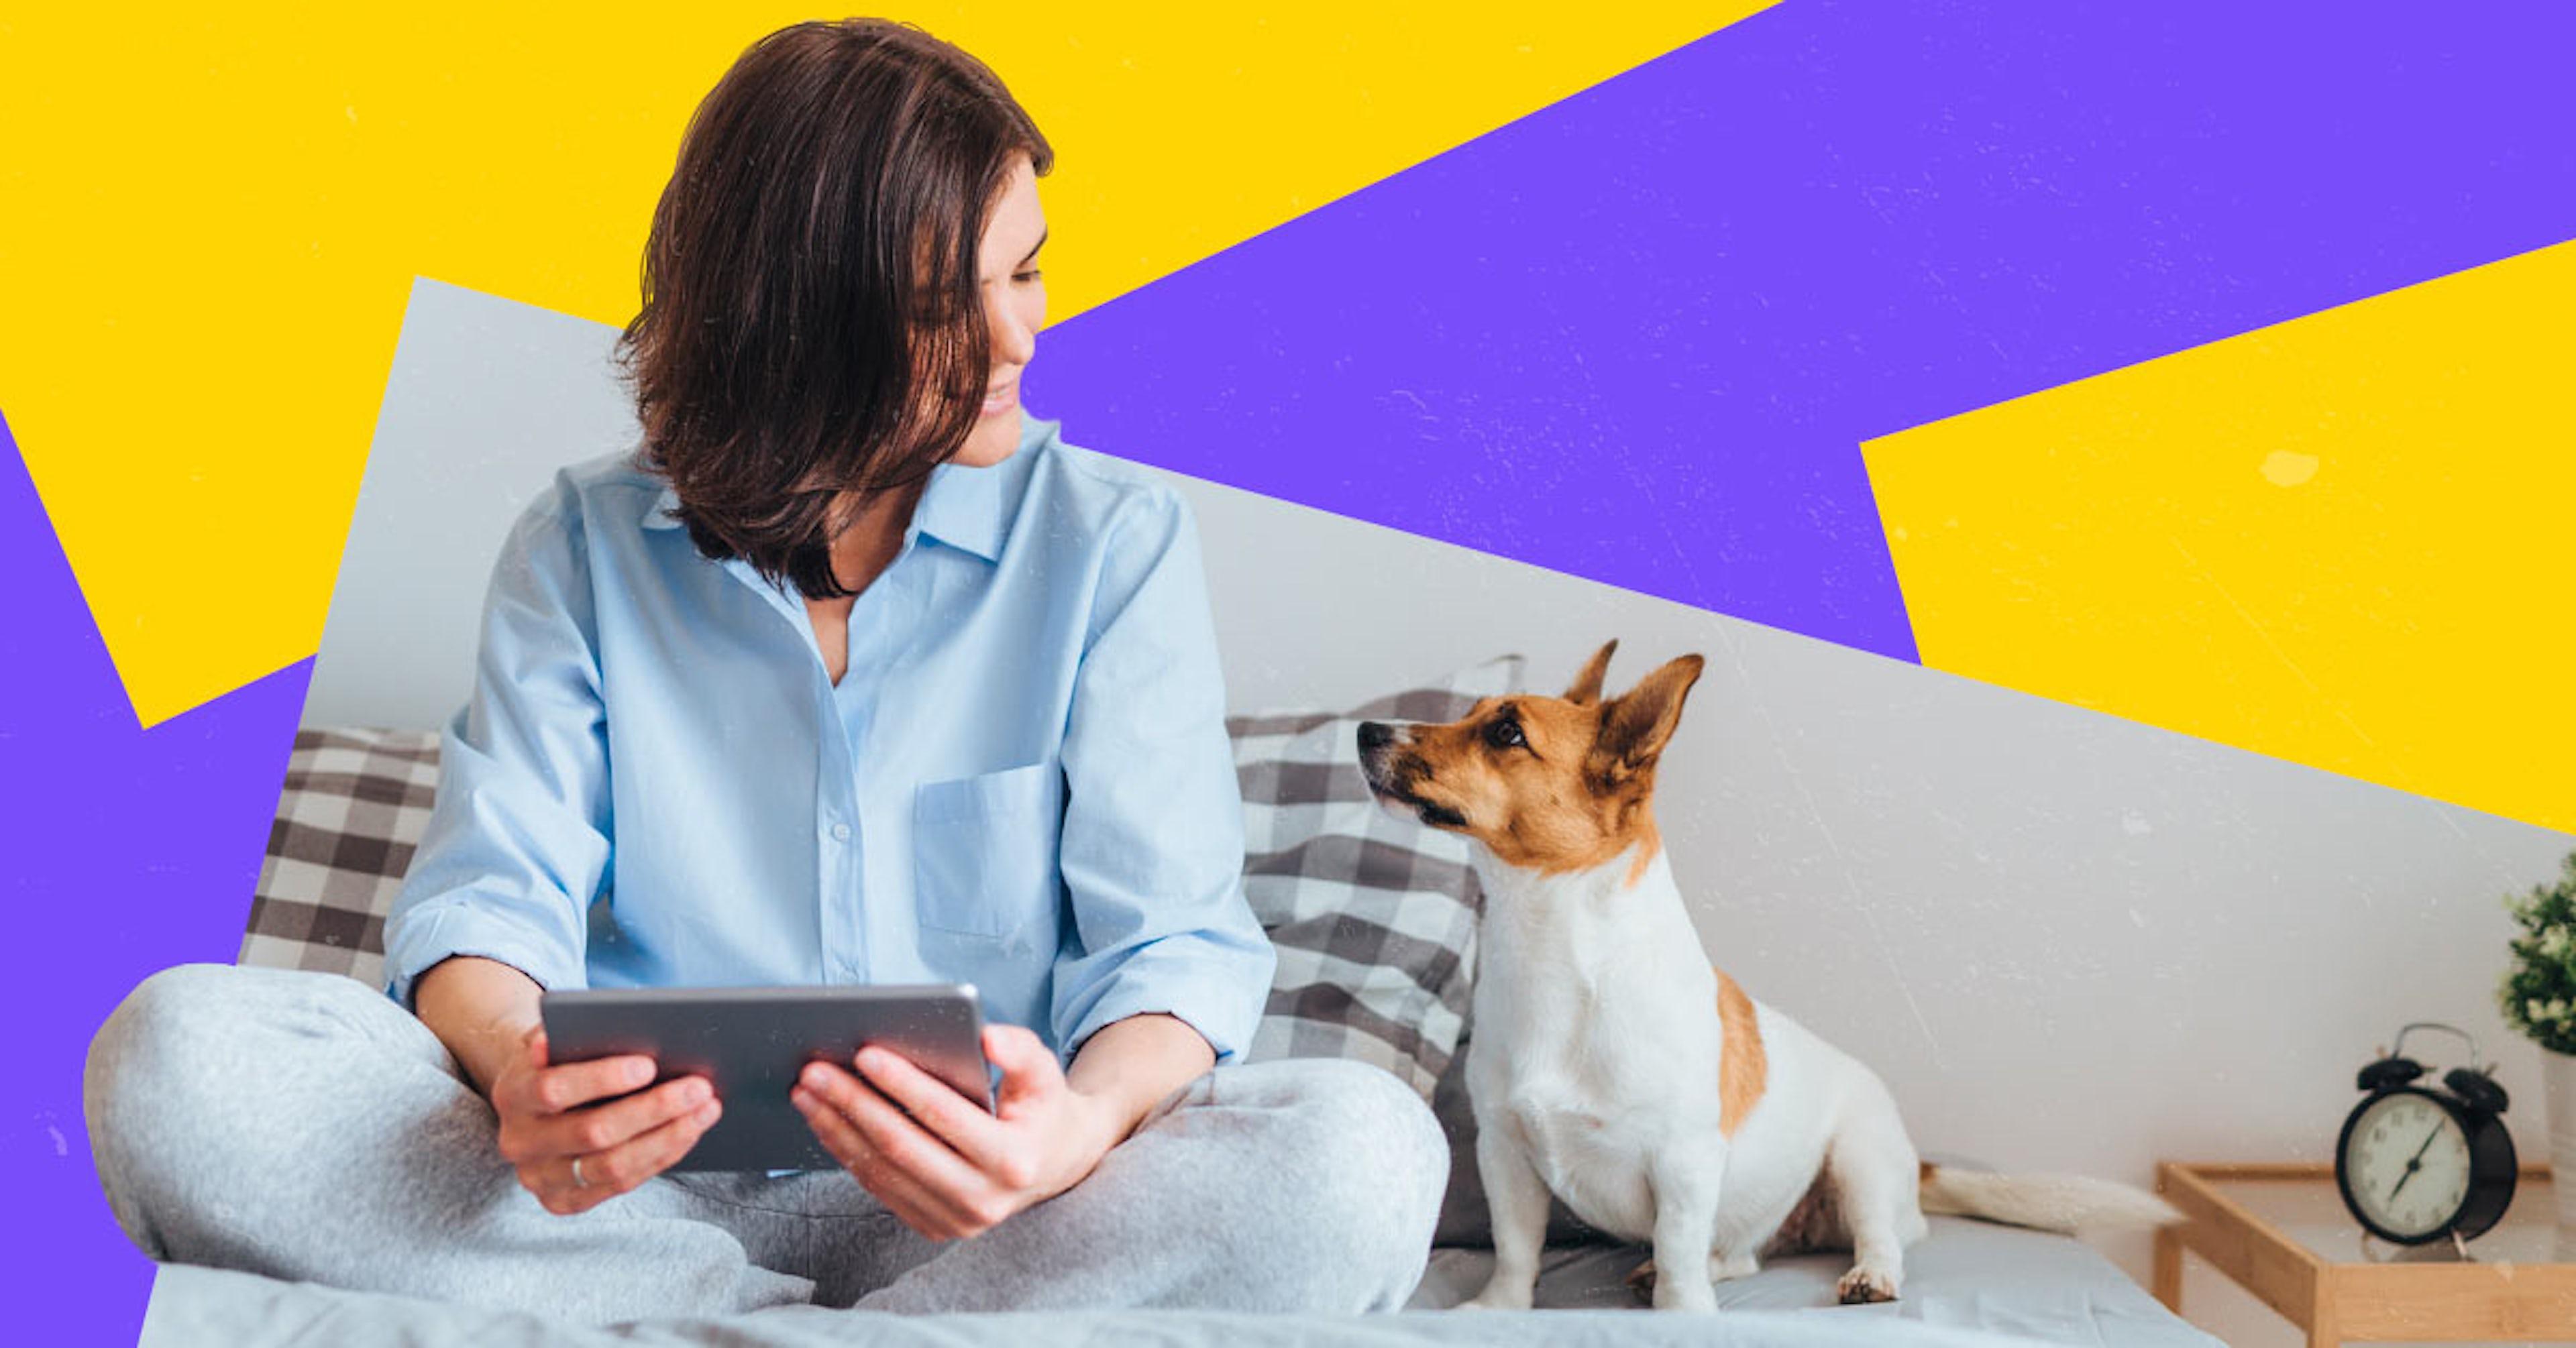 Nuevos hábitos para cuidar a tus mascotas